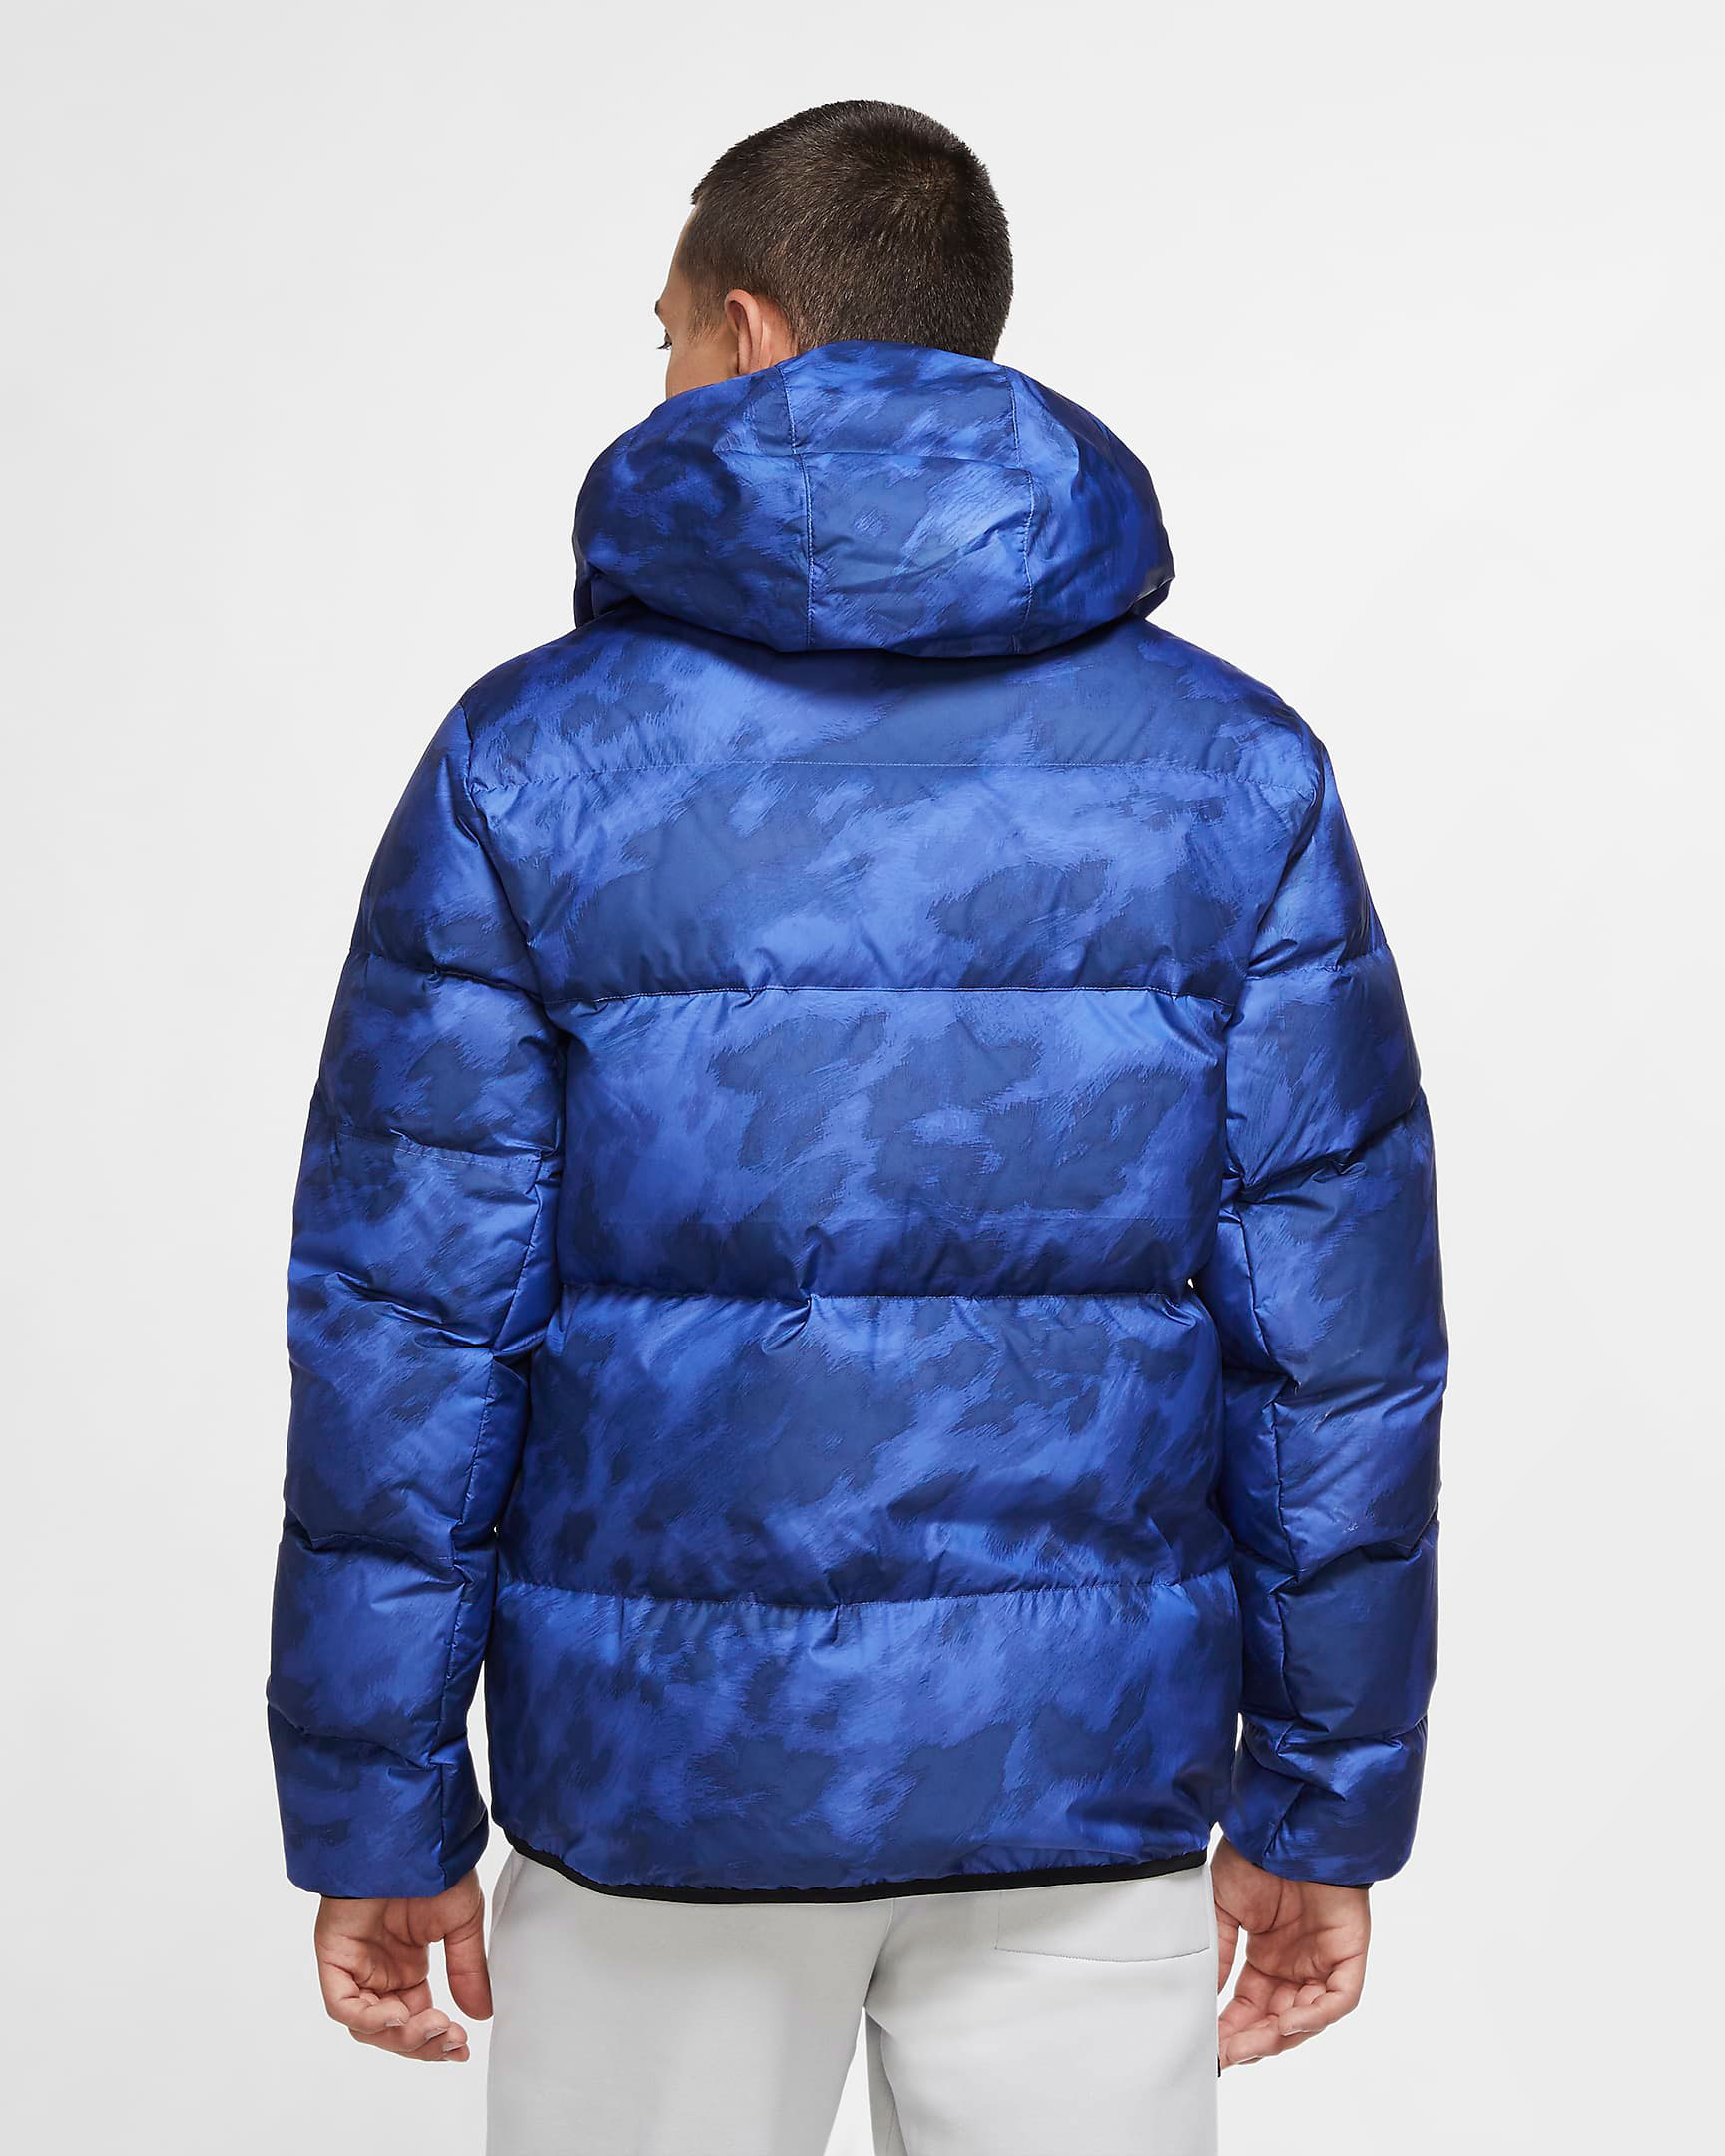 jordan-13-hyper-royal-black-nike-winter-jacket-2